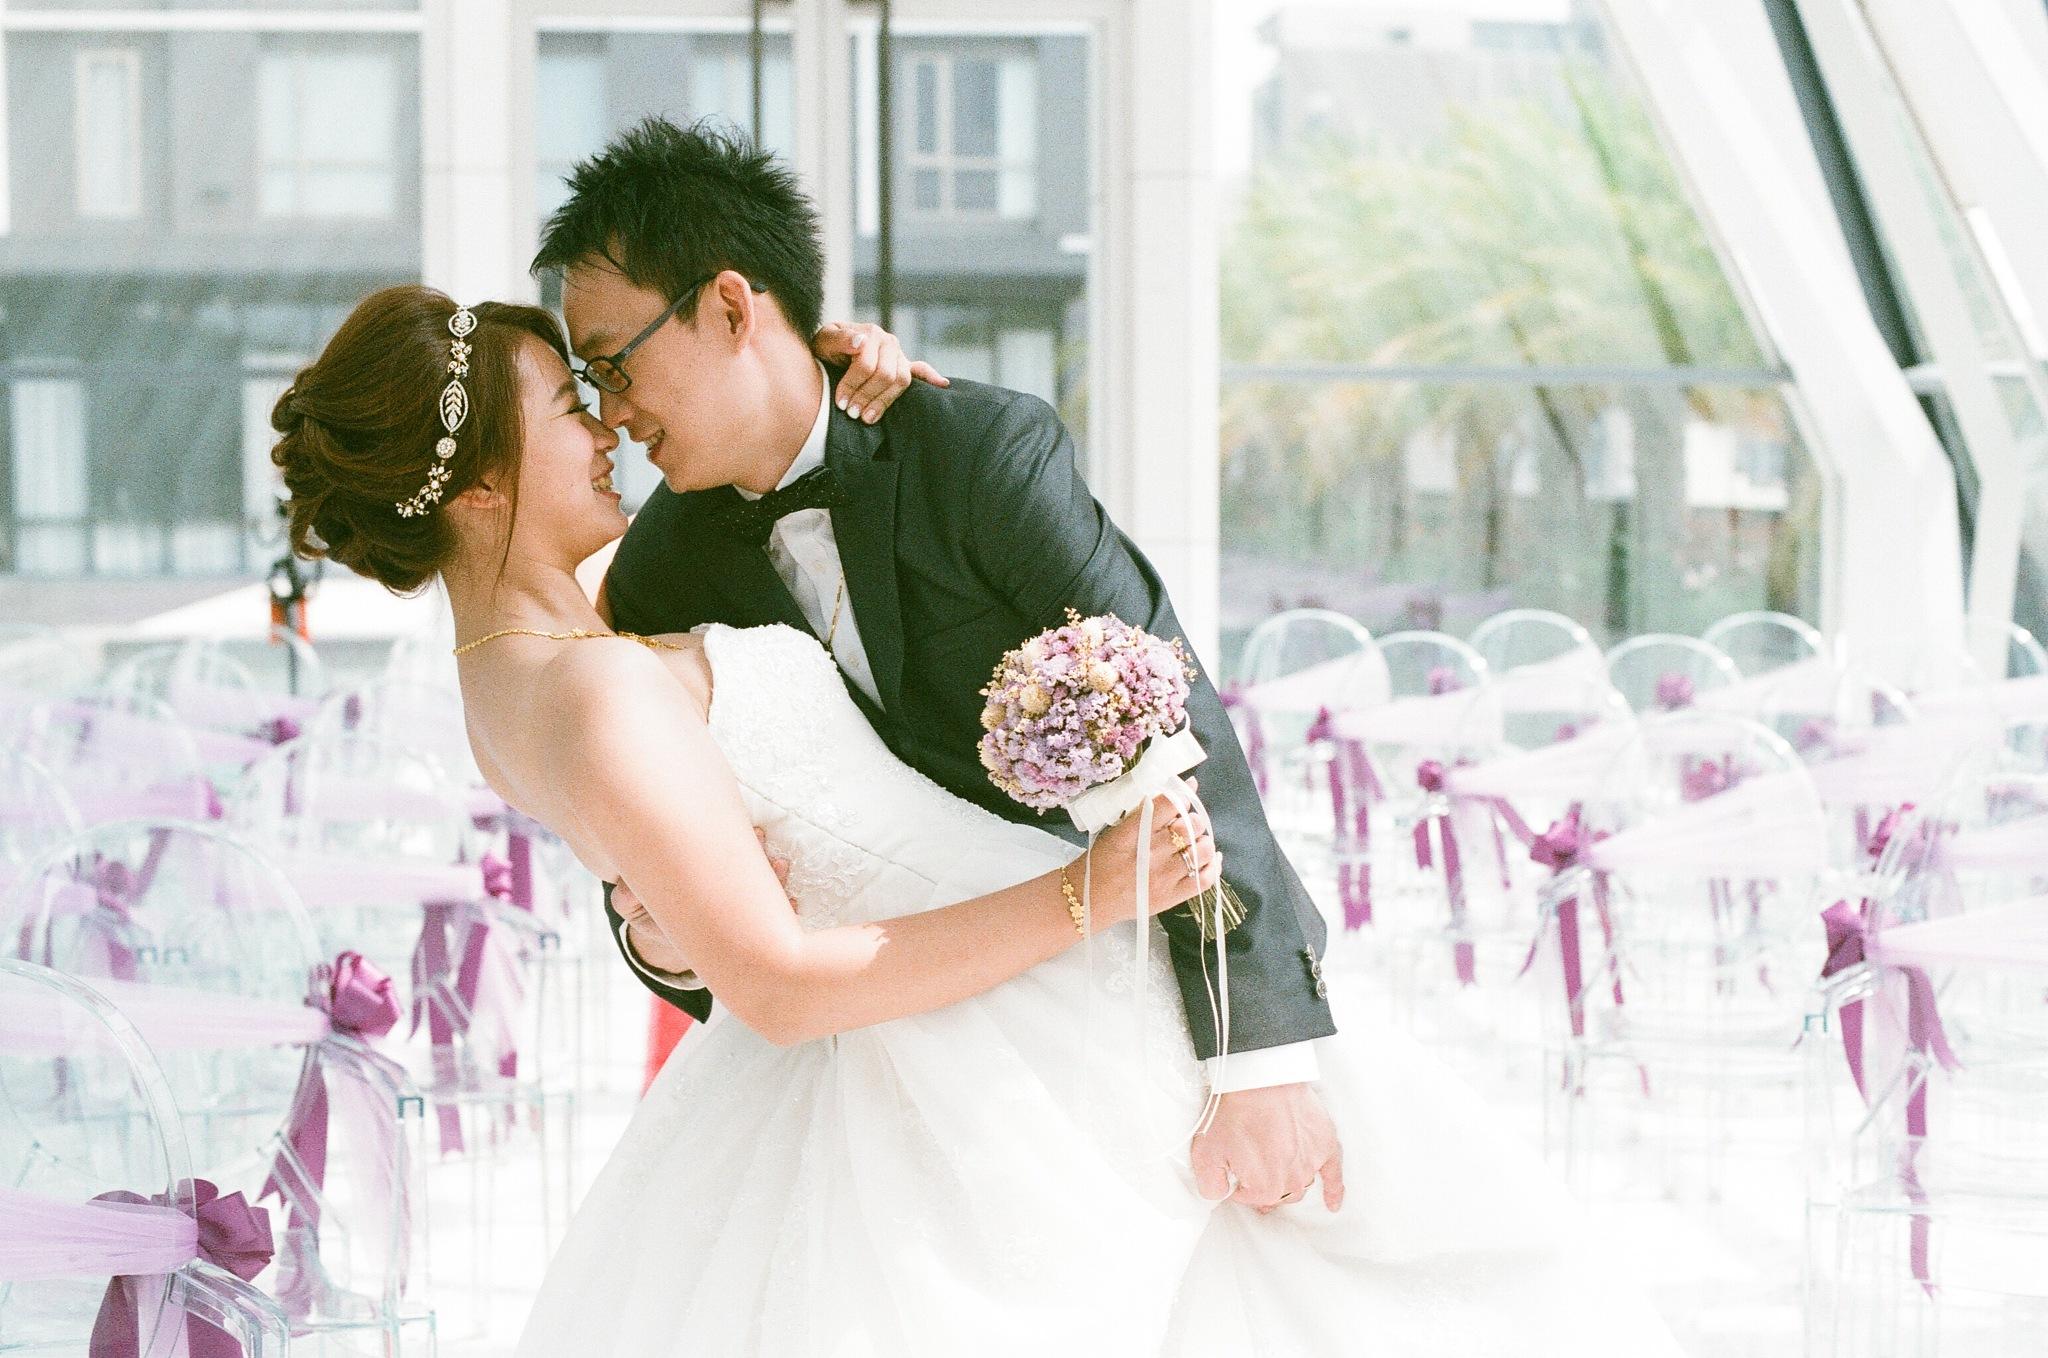 Emily's wedding / Kodak UltraMax / Nikon FM2 by Toomore Chiang